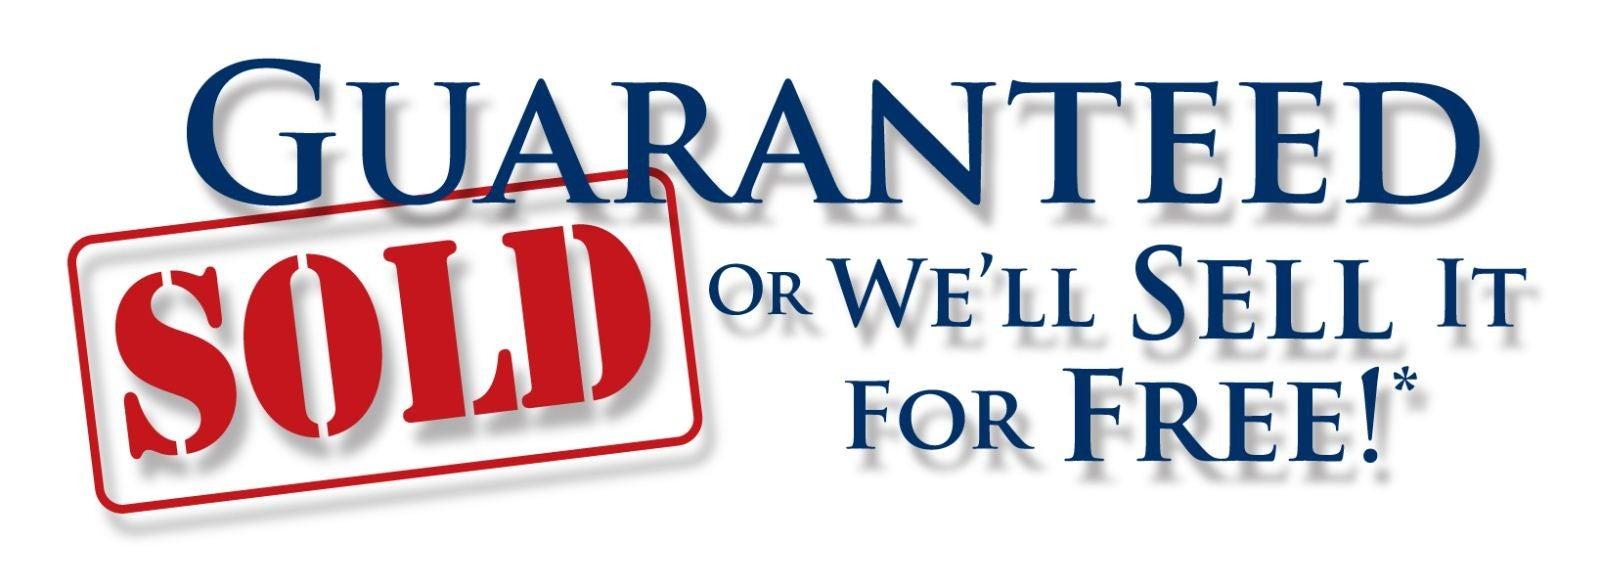 Guaranteed Sold!